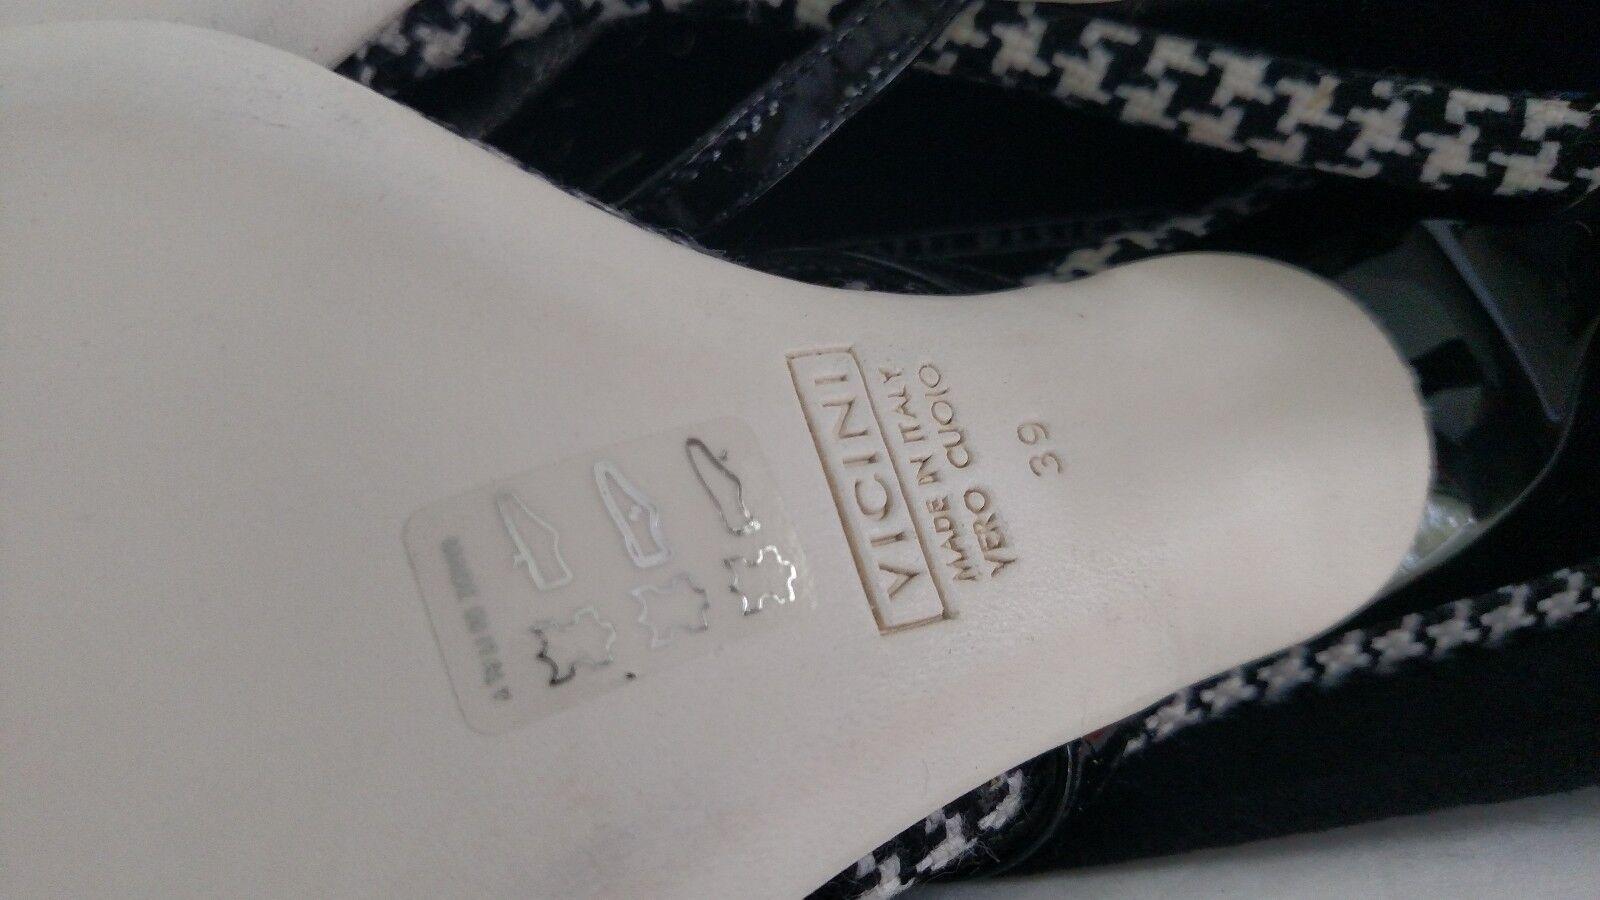 Giuseppe Giuseppe Giuseppe Zanotti Design  Women's Beads Decorated Flip Flop shoes Sizes 9 B 2576b1